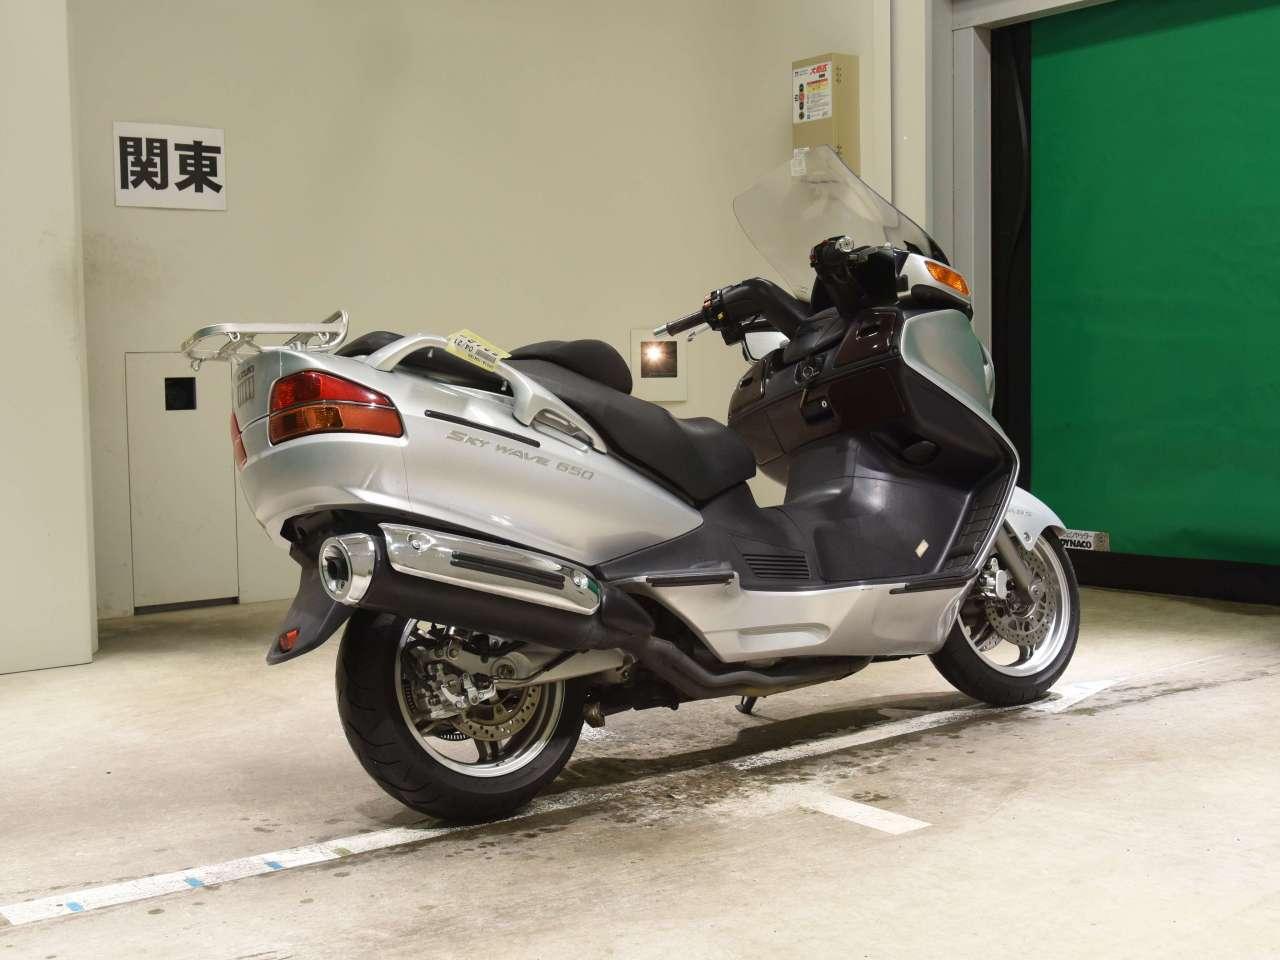 МАКСИ-СКУТЕР  SKYWAVE 650LX  Артмото - купить квадроцикл в украине и харькове, мотоцикл, снегоход, скутер, мопед, электромобиль